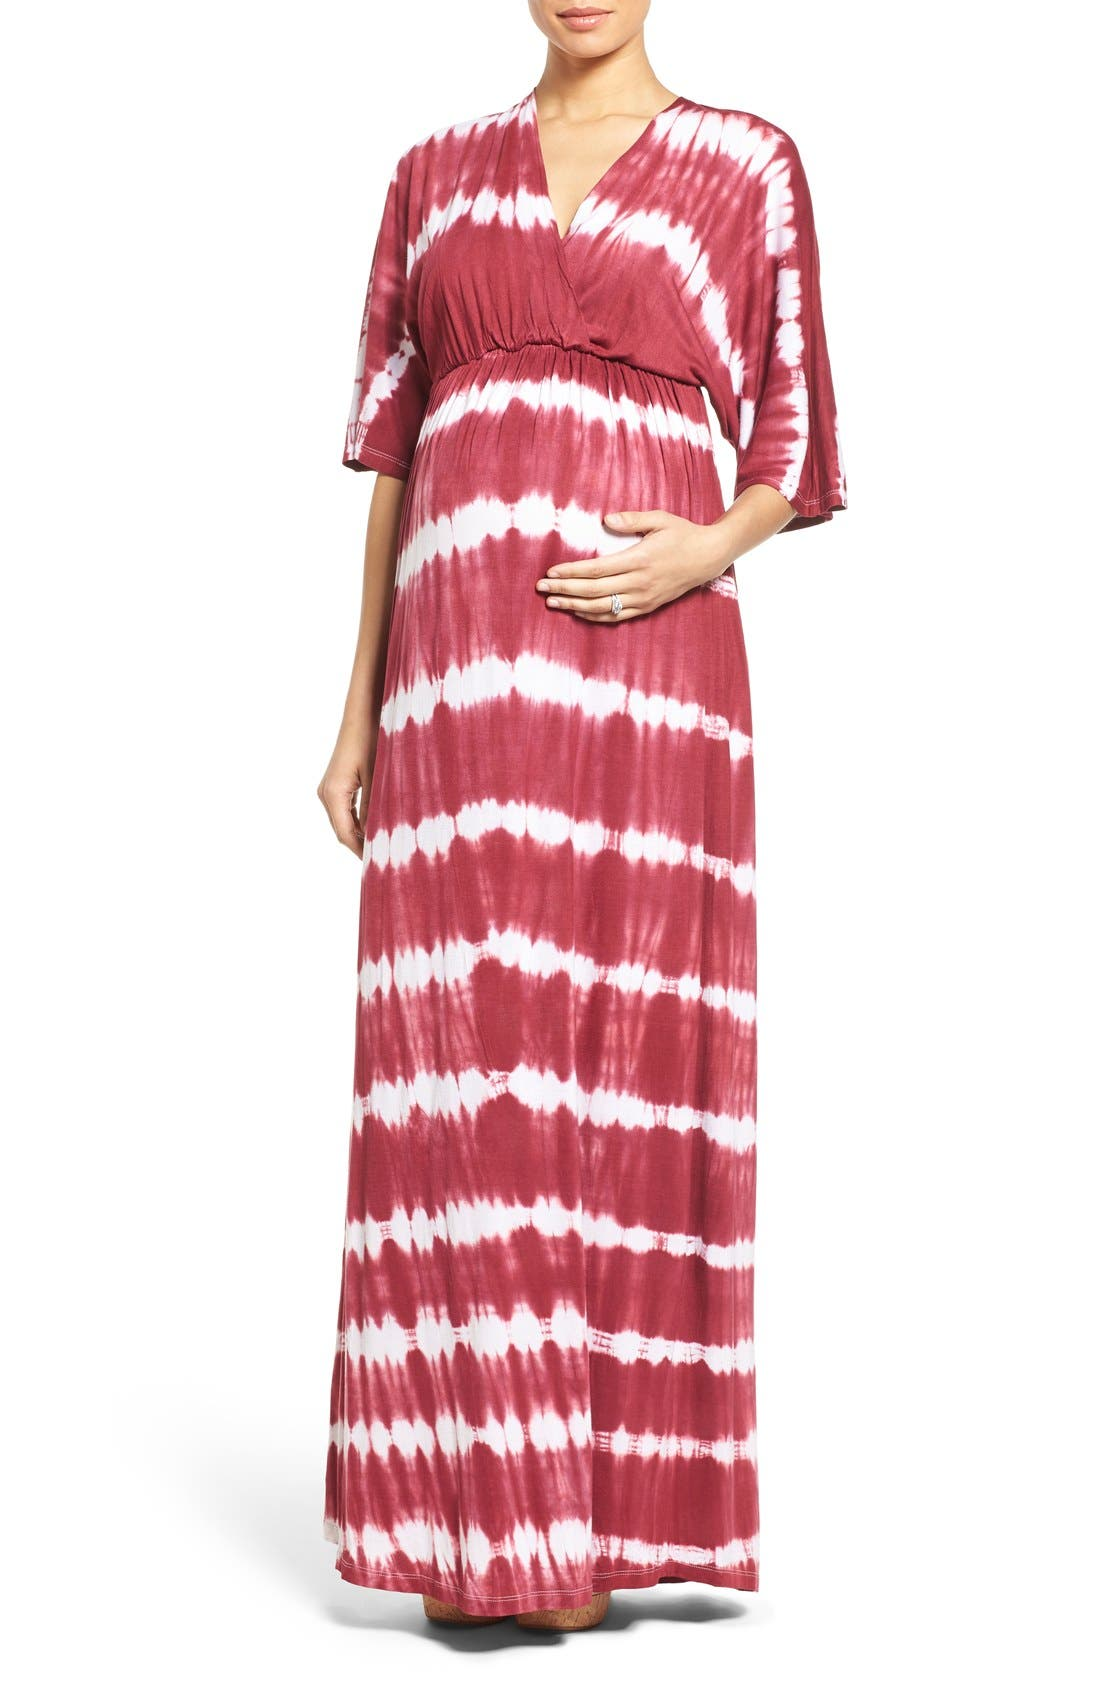 Main Image - Fillyboo 'Dream Shakey' Tie Dye Maternity Maxi Dress